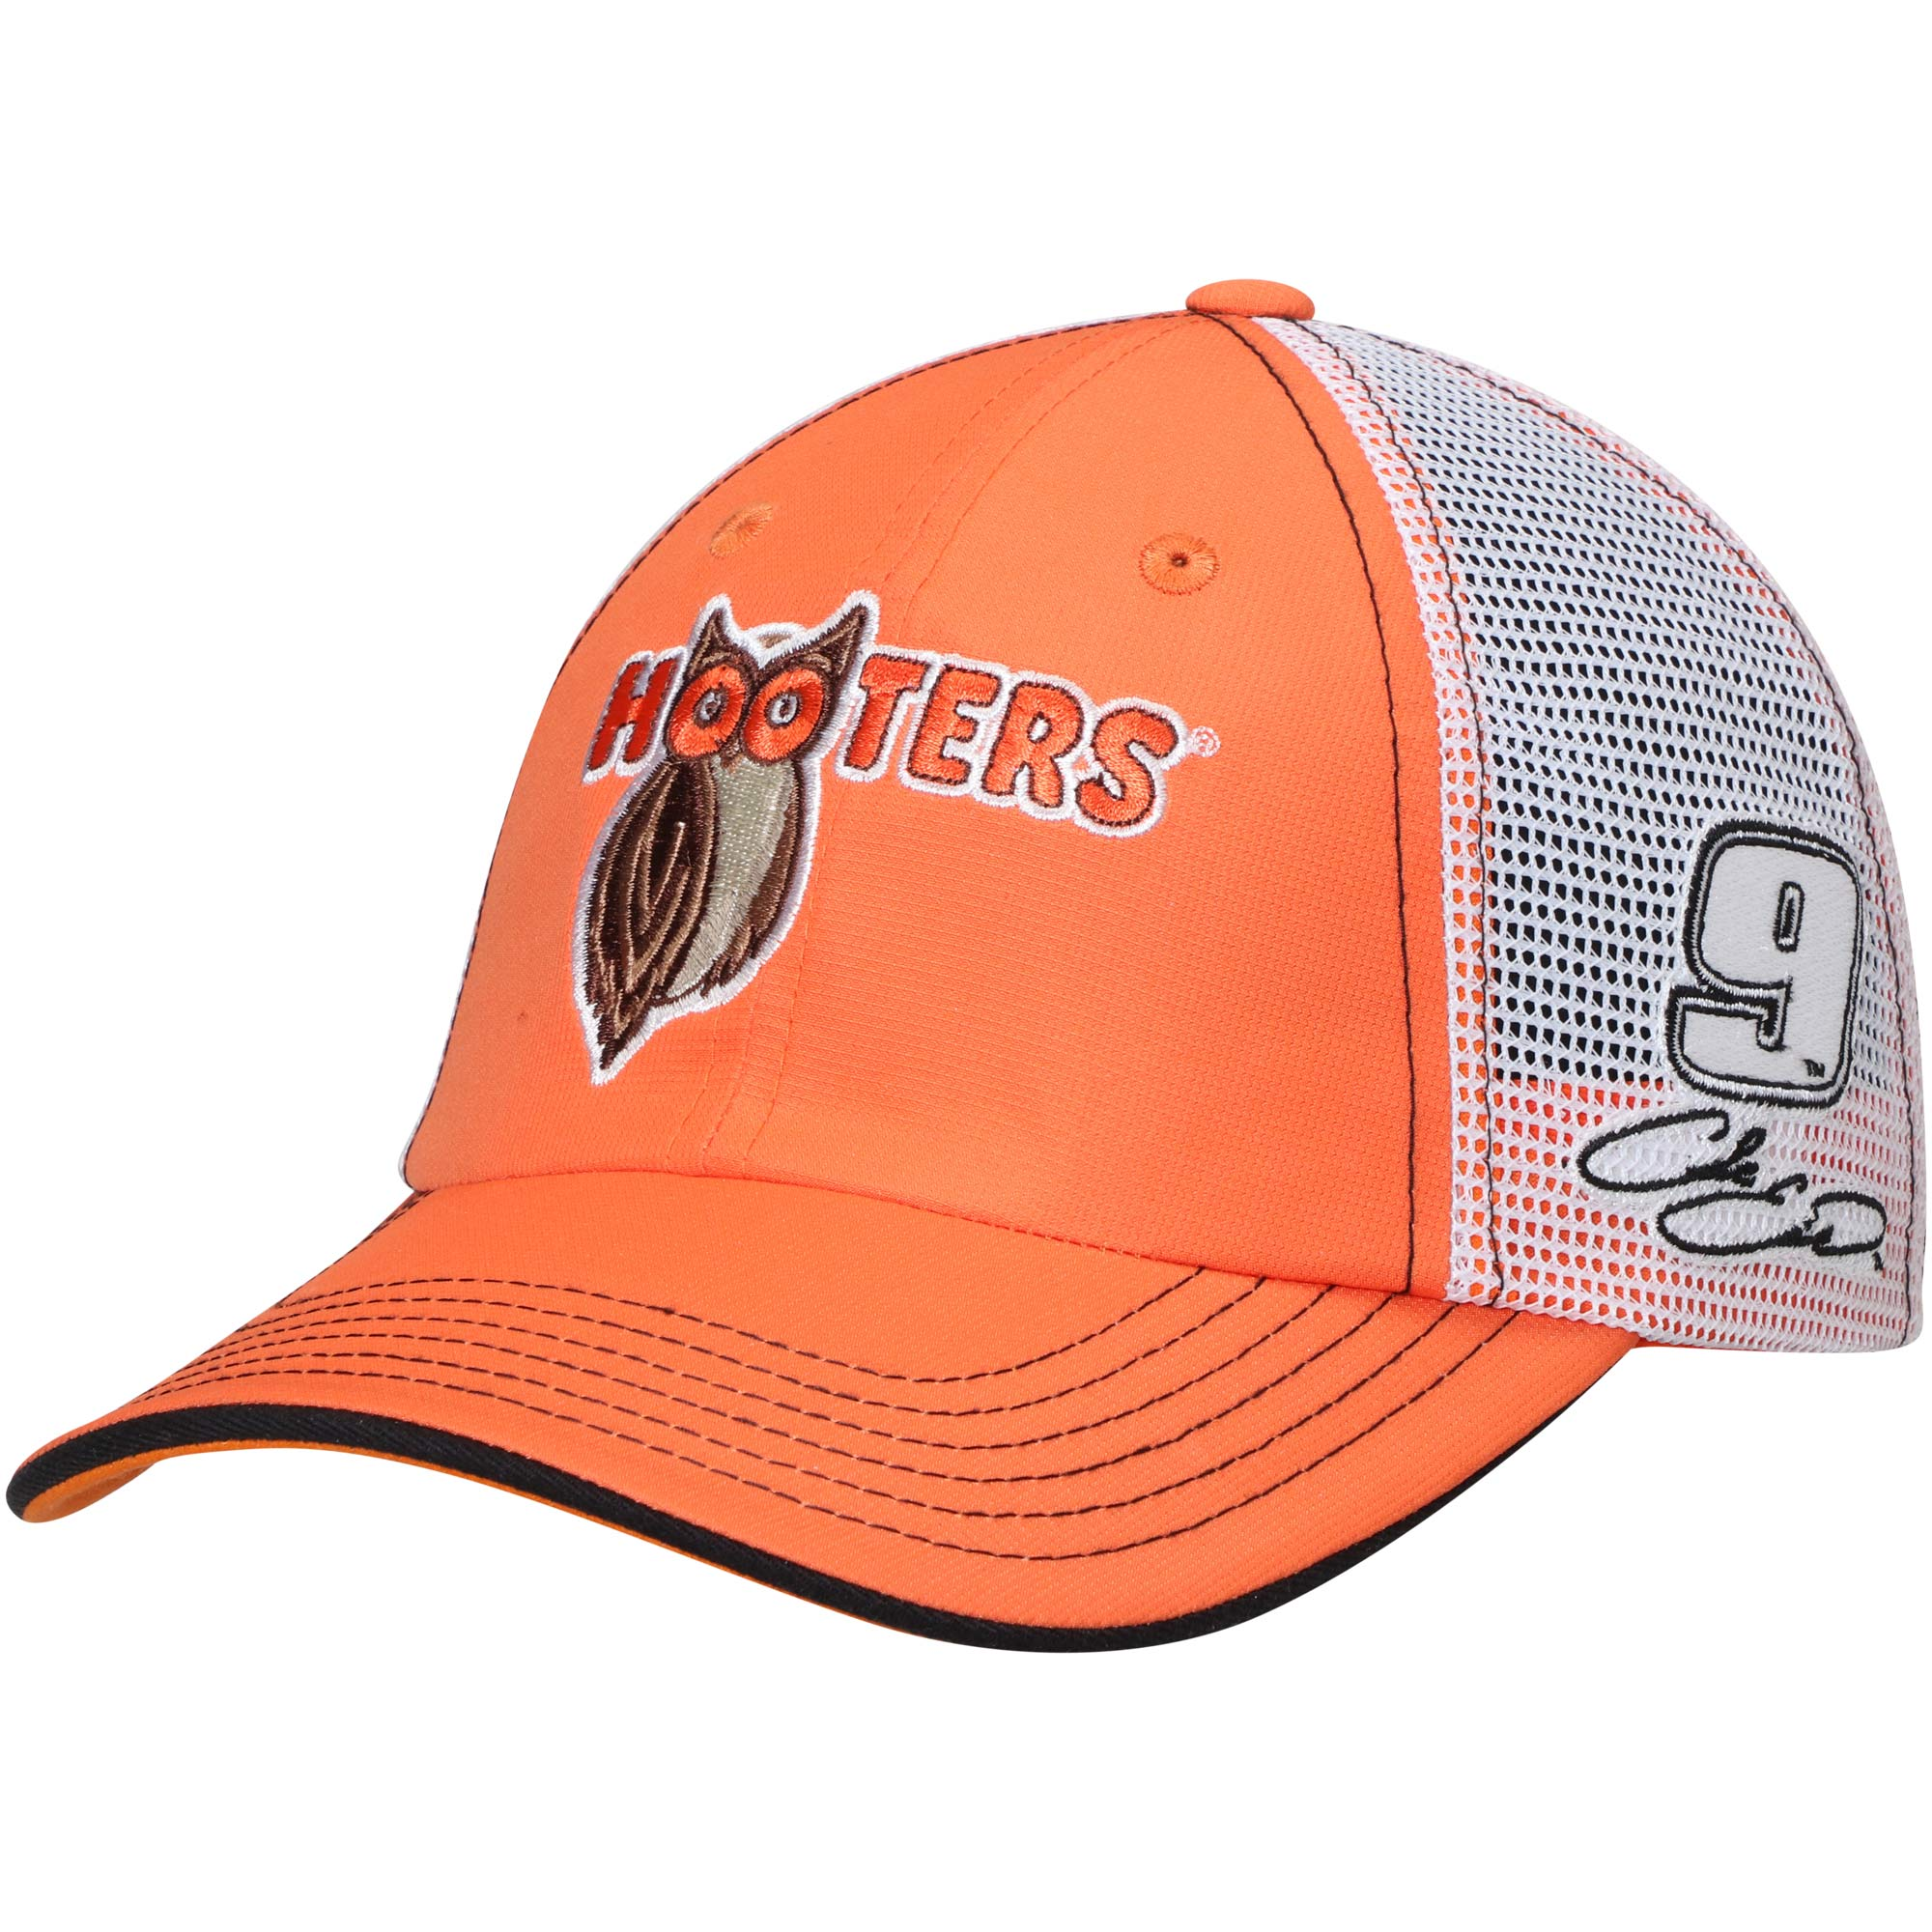 Chase Elliott Checkered Flag Hooters Driver Adjustable Hat - Orange/White - OSFA